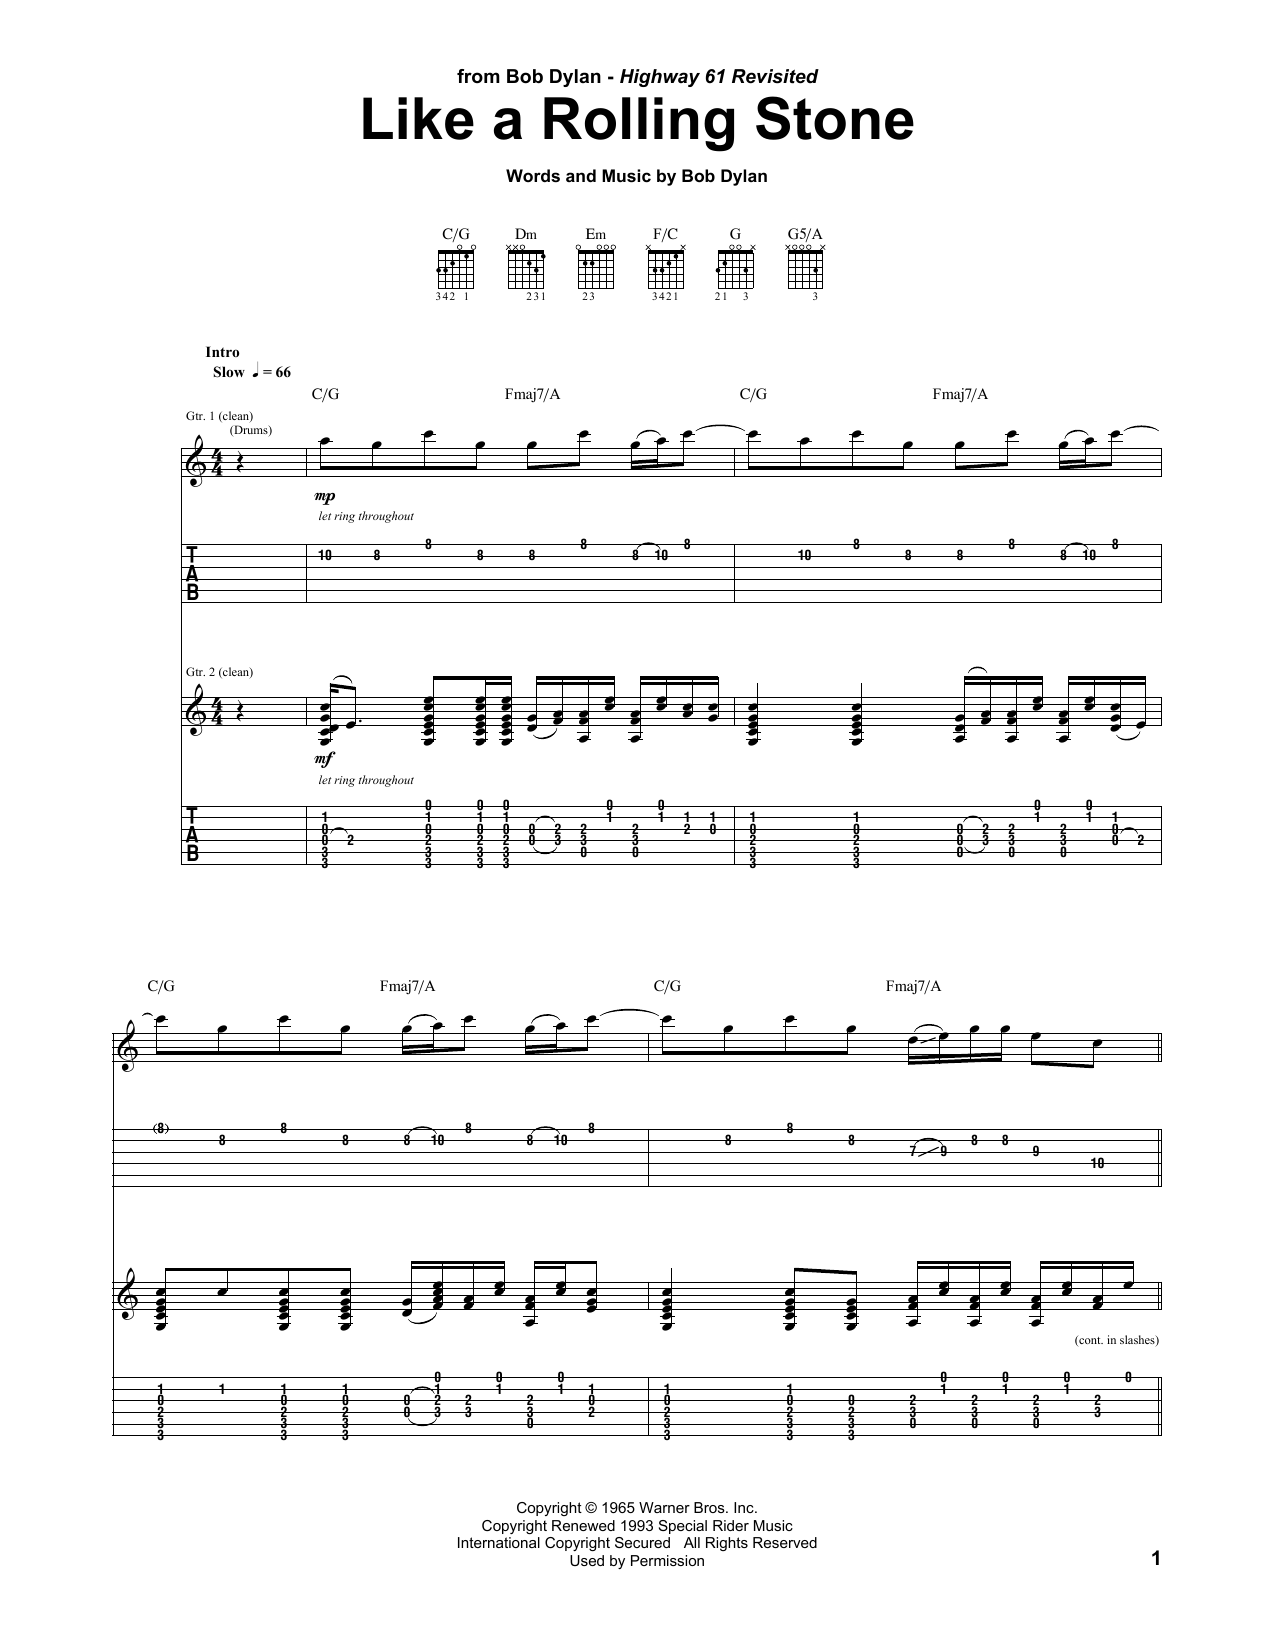 Like a stone tab pdf